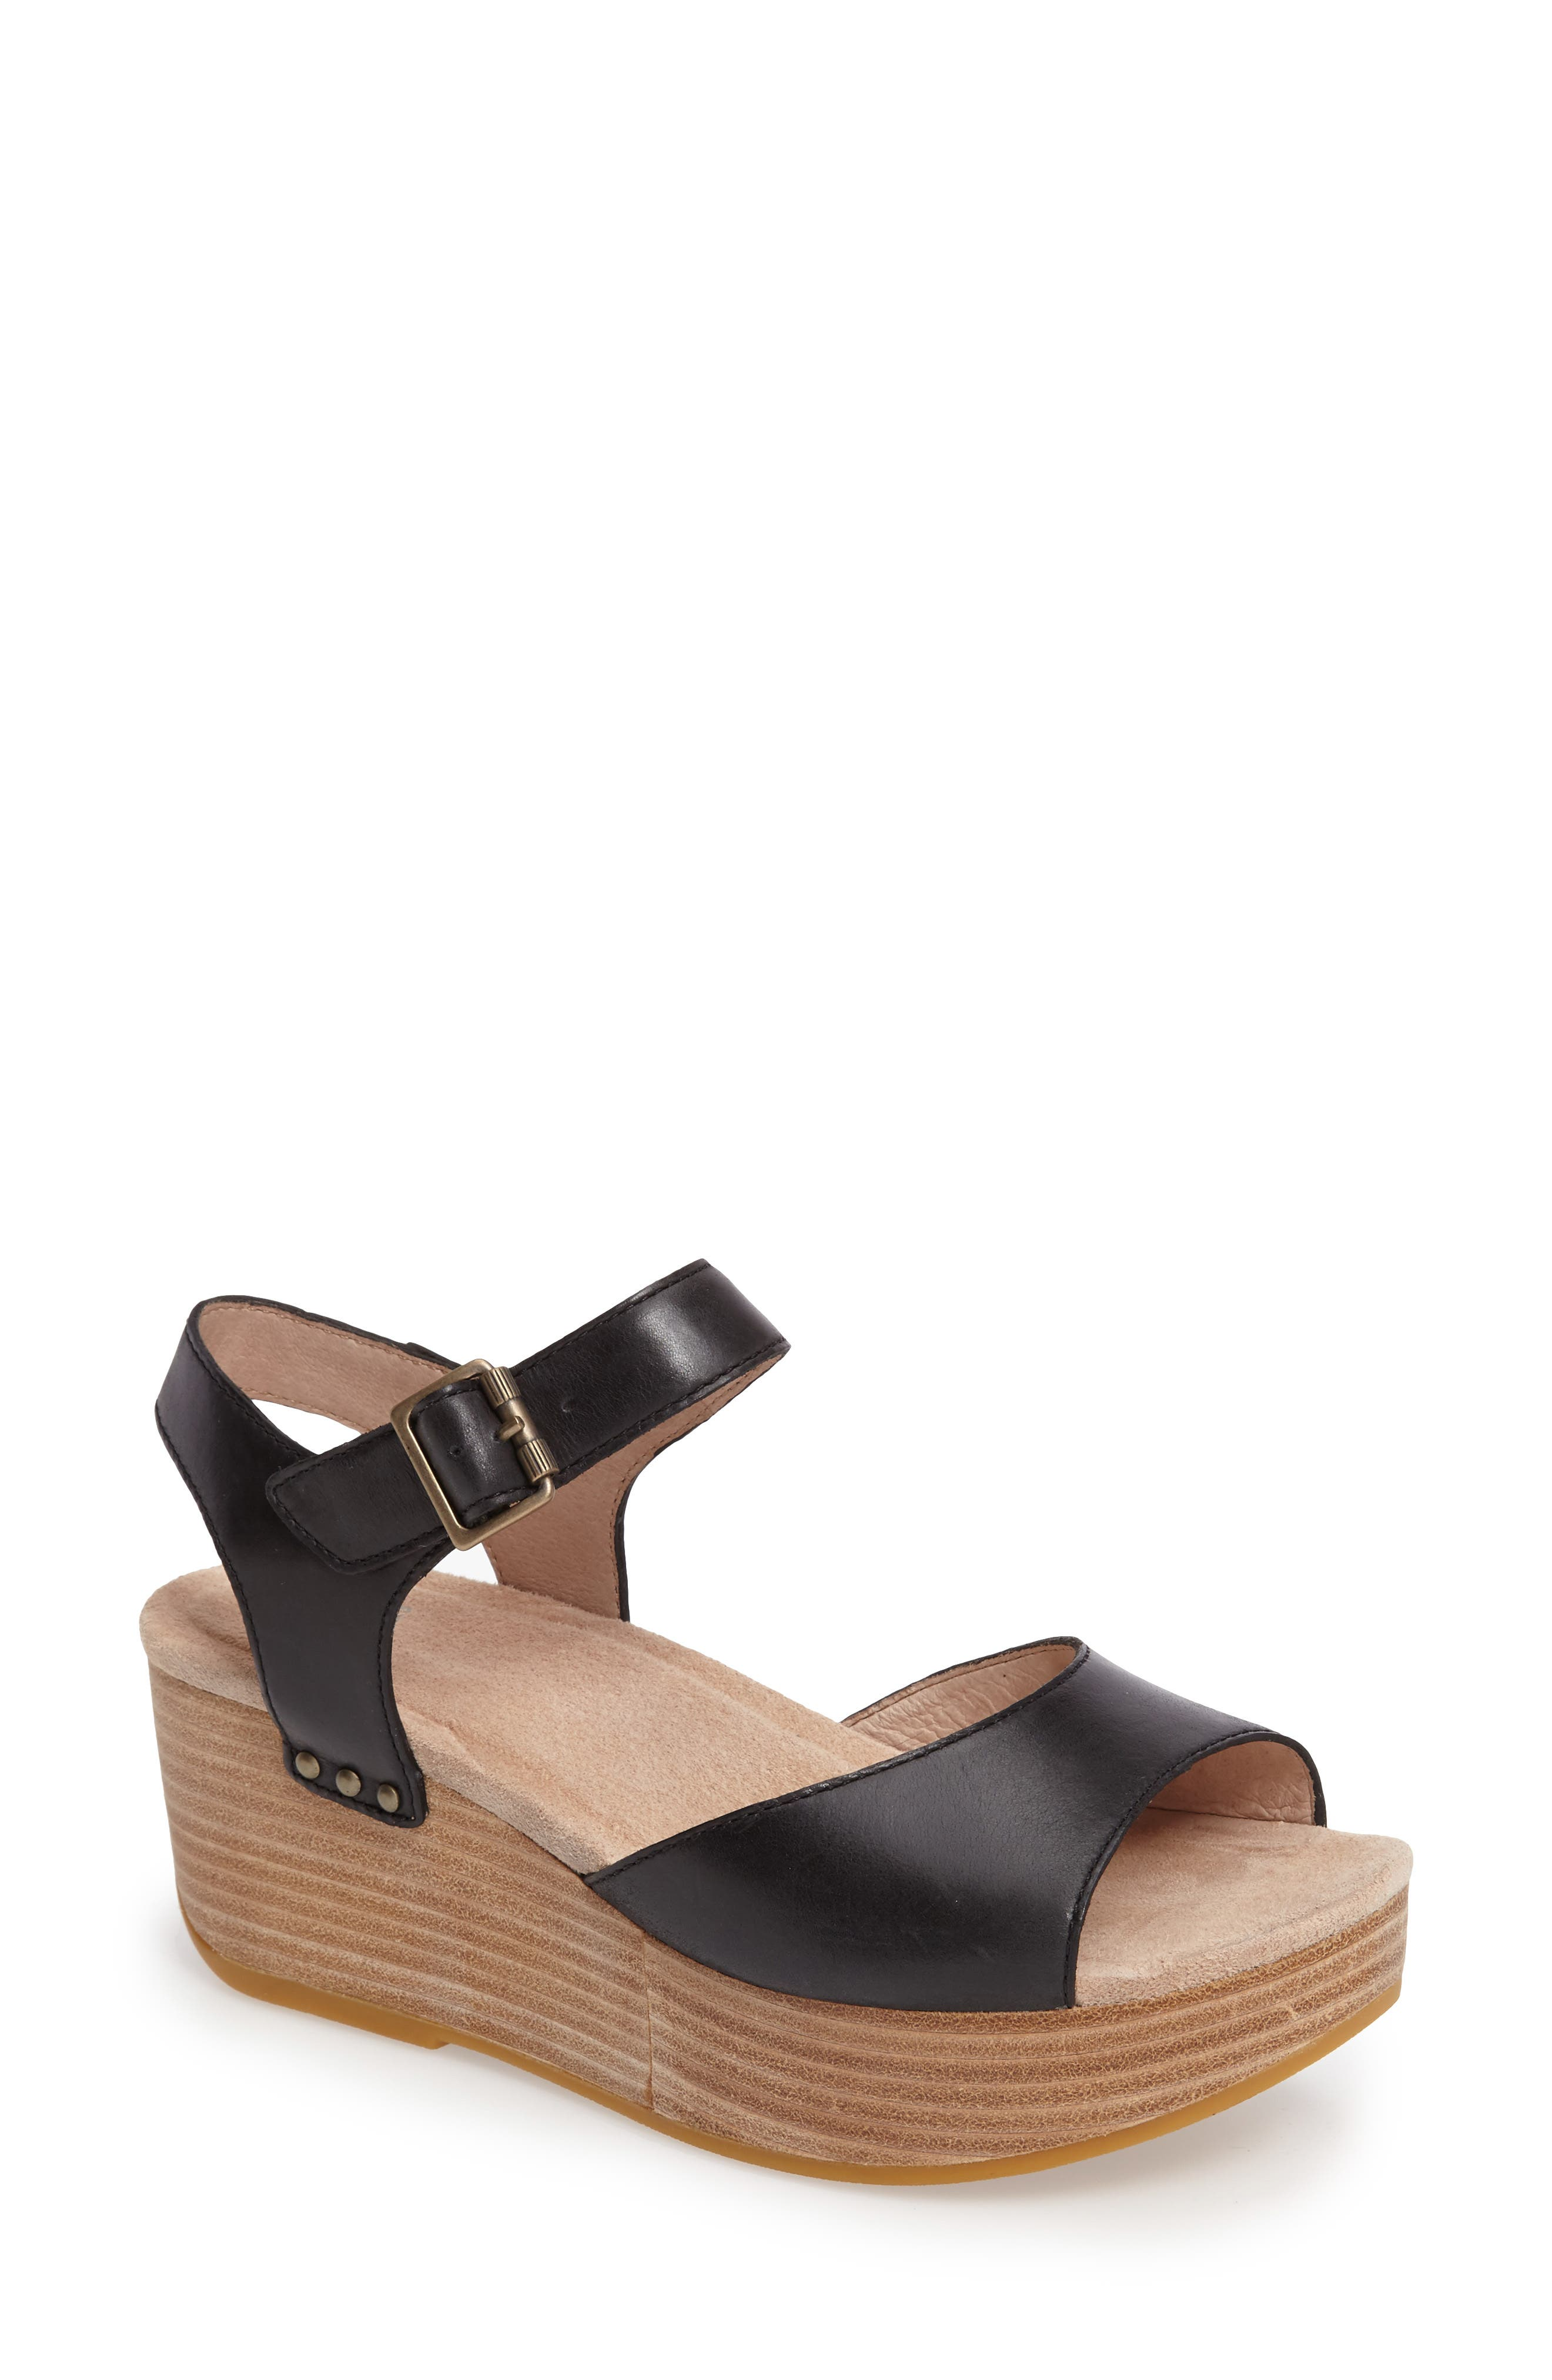 Main Image - Dansko Silvie Platform Wedge Sandal (Women)